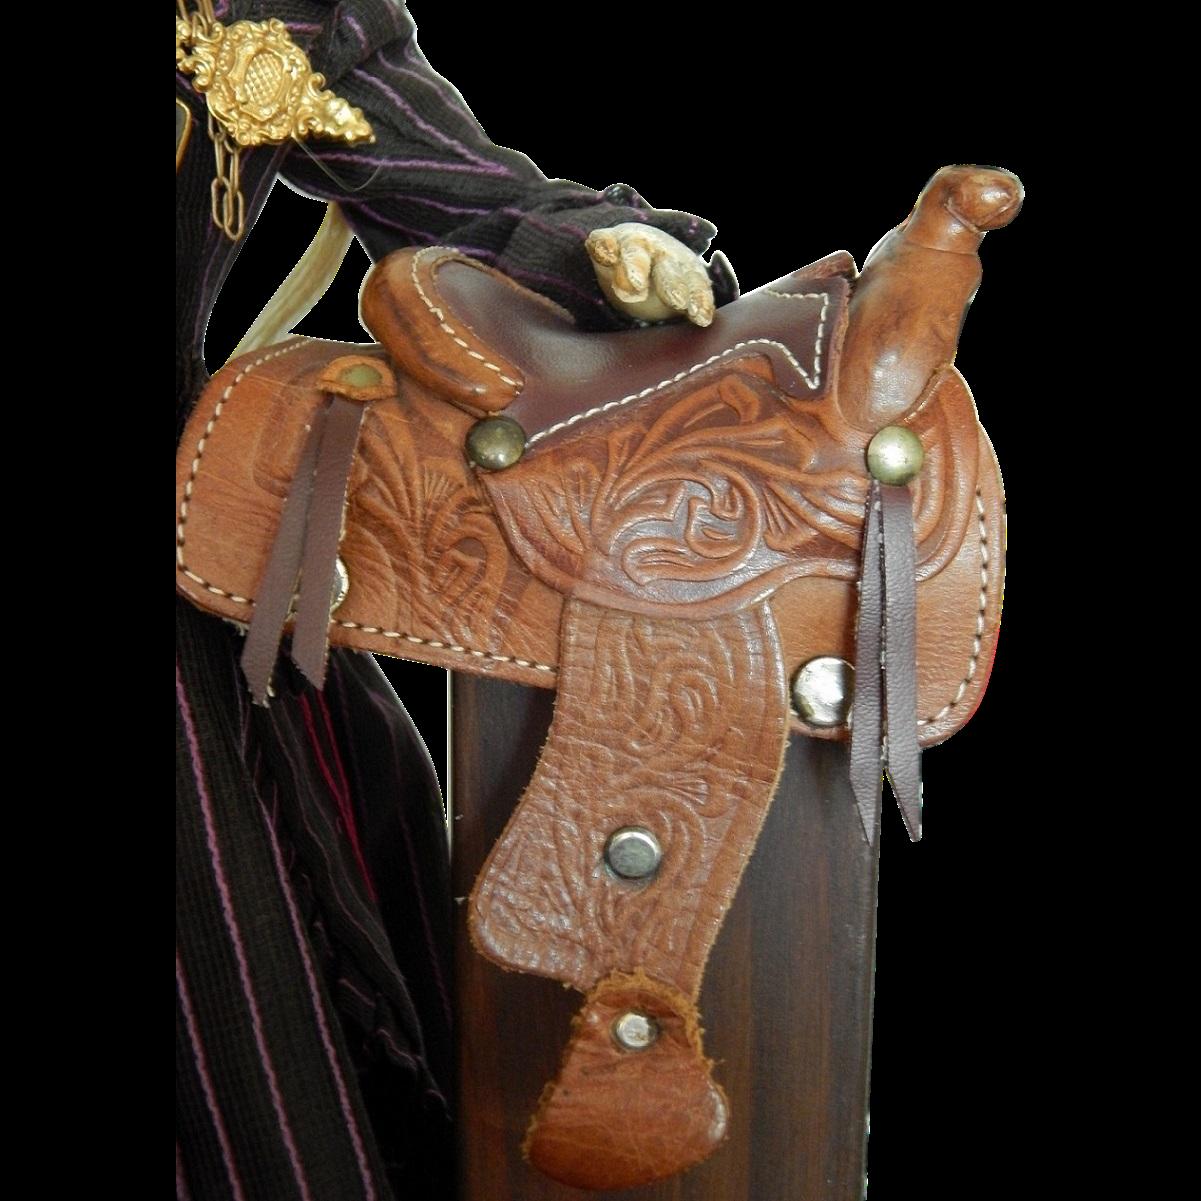 Vintage Leather Saddle 25